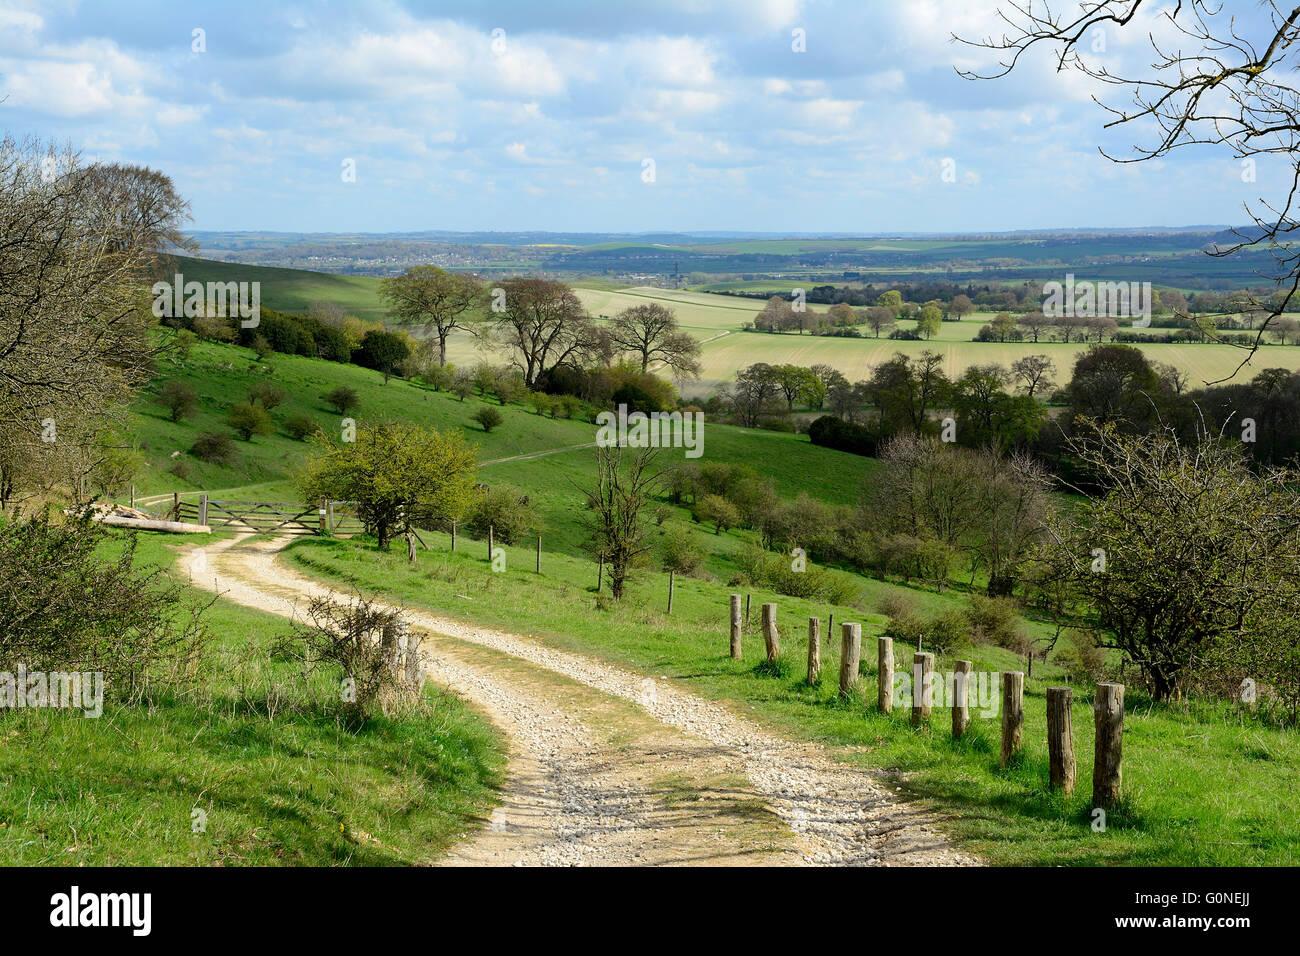 winding rural track through Ashridge in Chiltern Hills, England - Stock Image